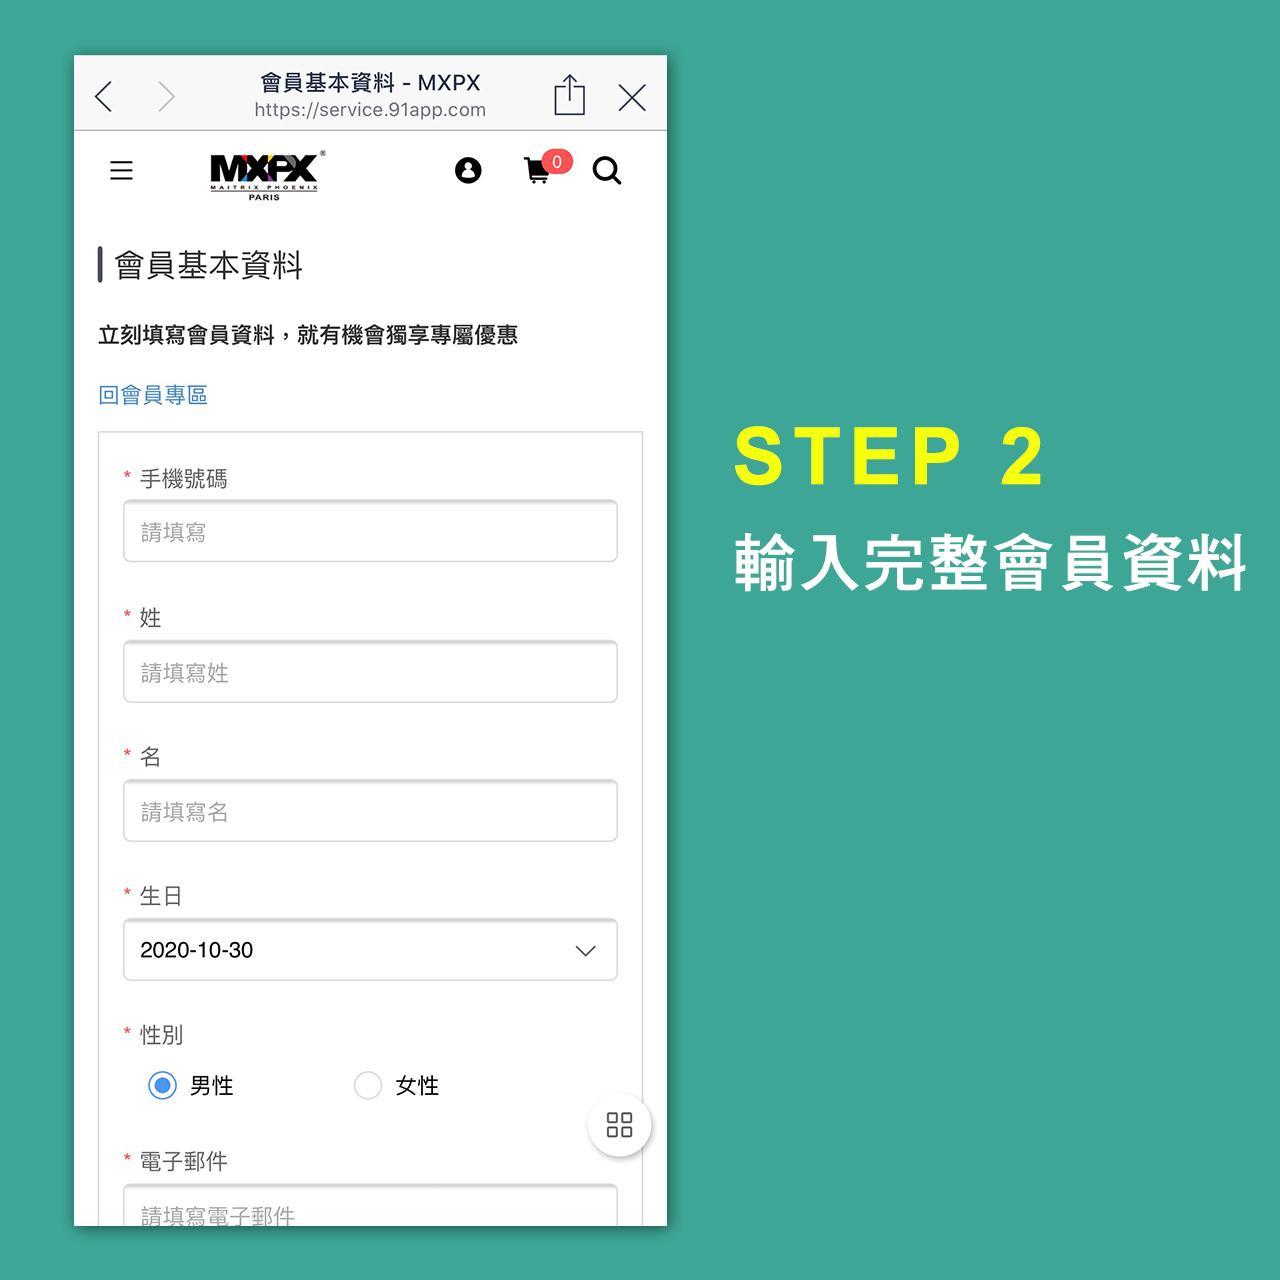 STEP 2-1